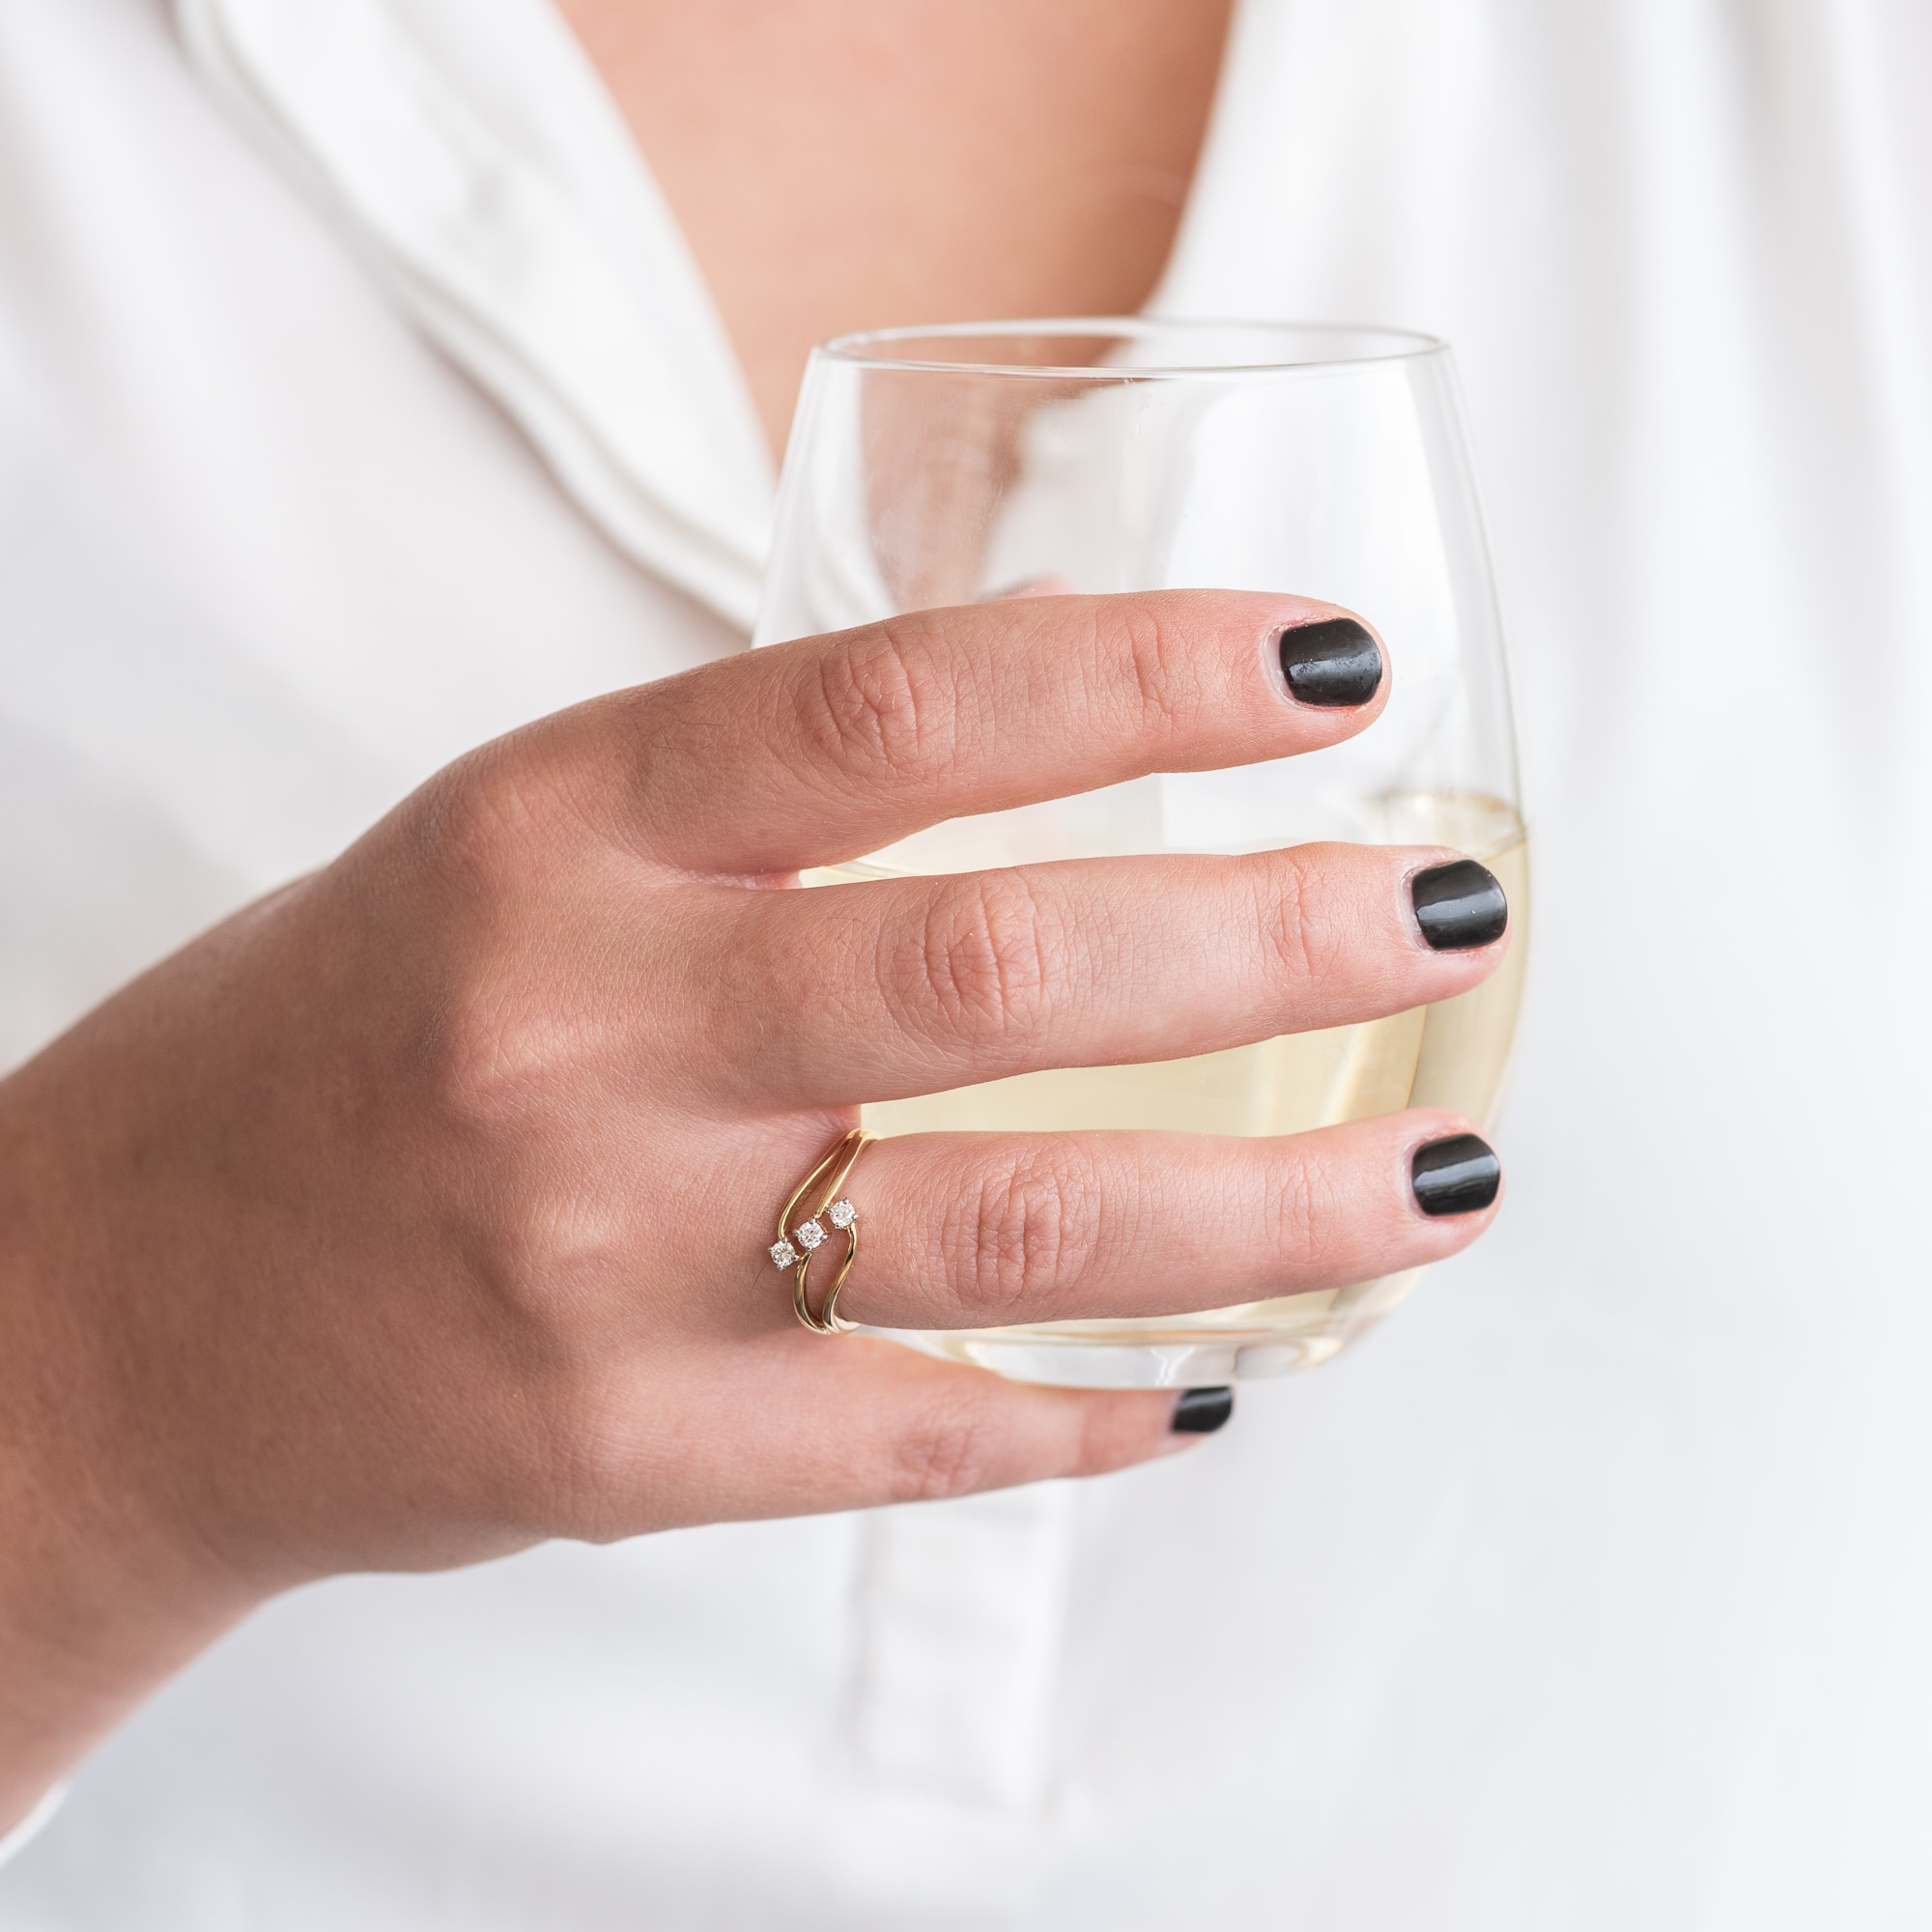 טבעת vow